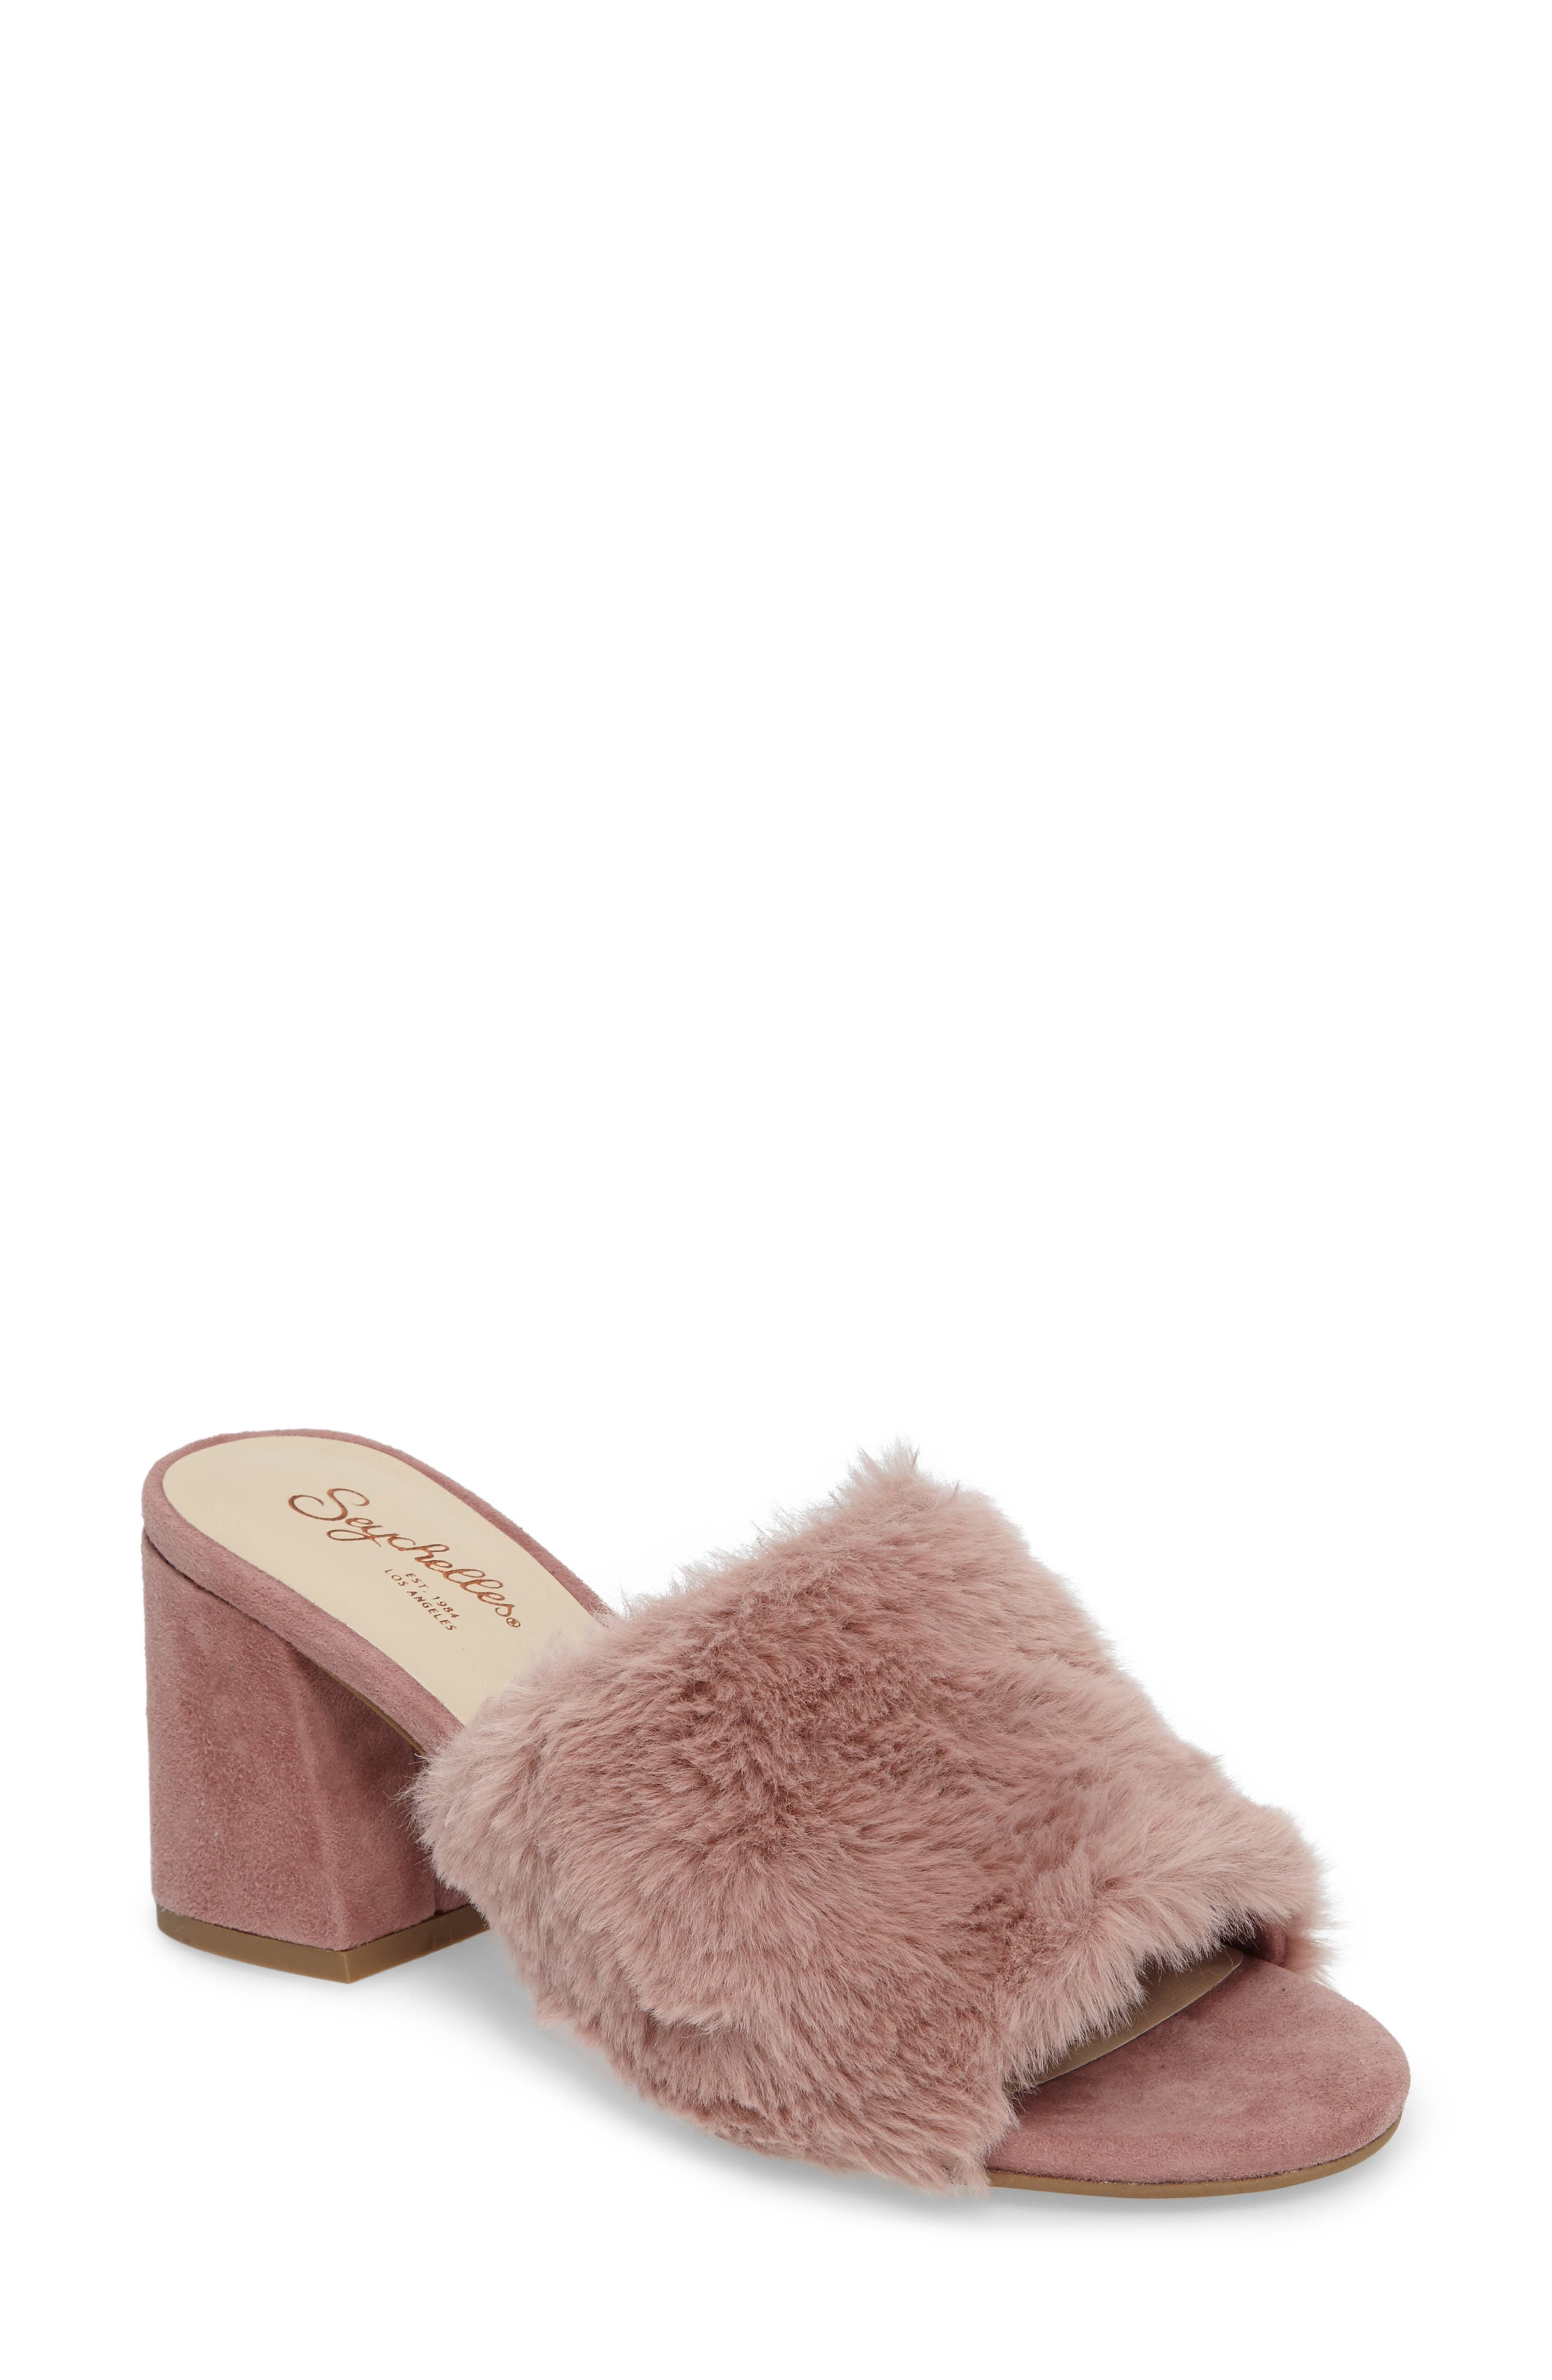 Main Image - Seychelles Nobody Else Faux Fur Slide Sandal (Women)